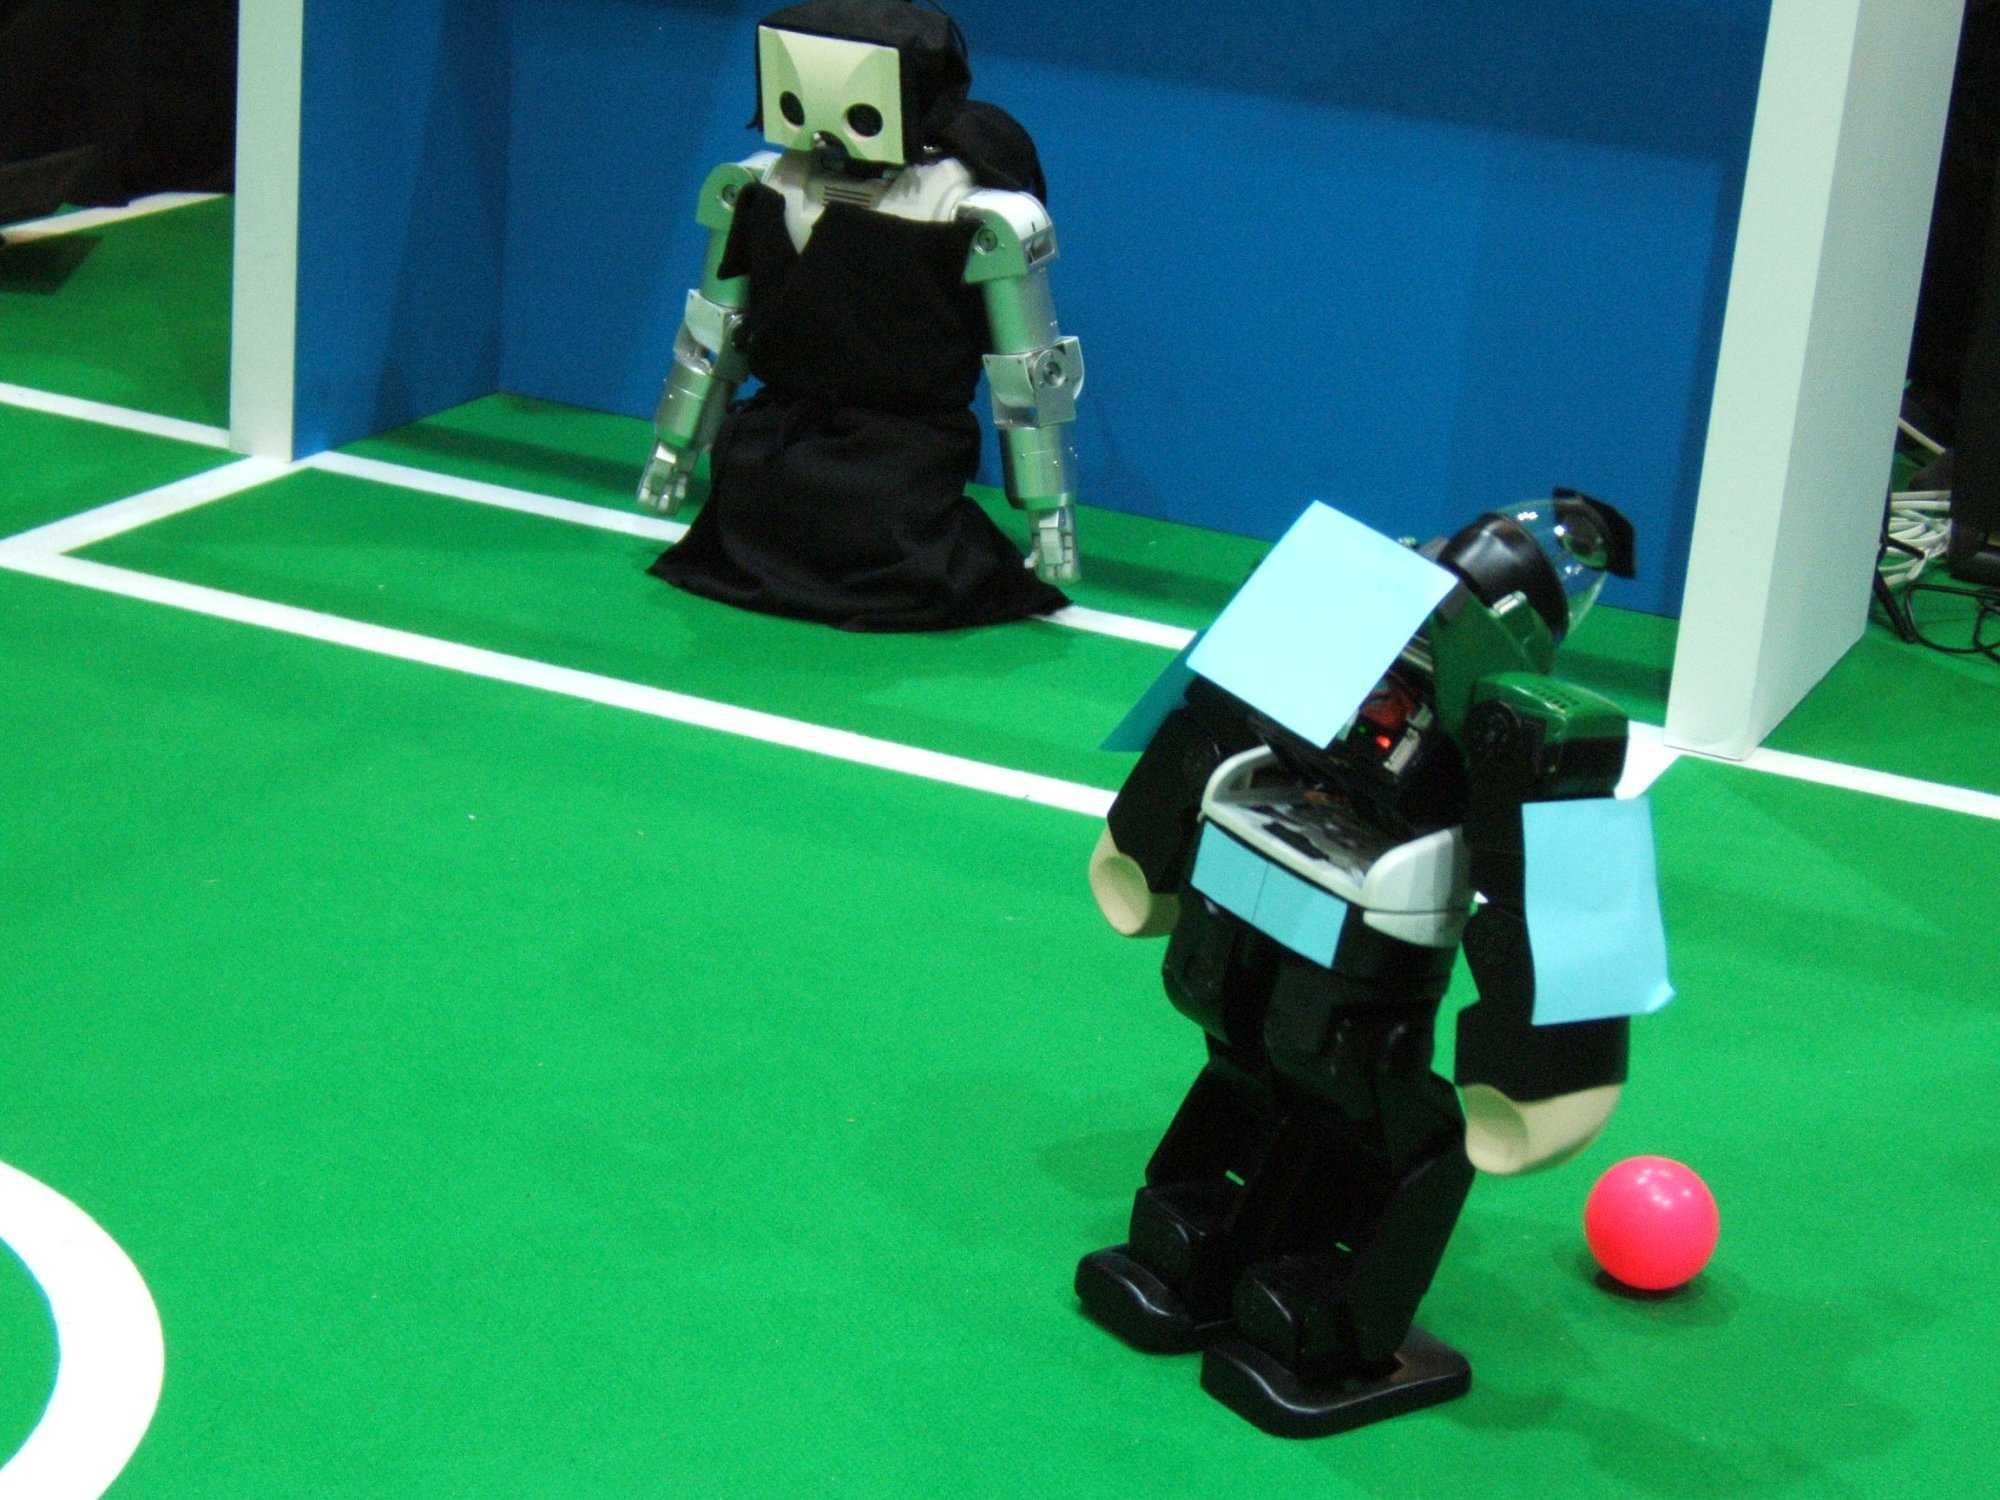 Der humanoide Roboter Vision Nexta denkt